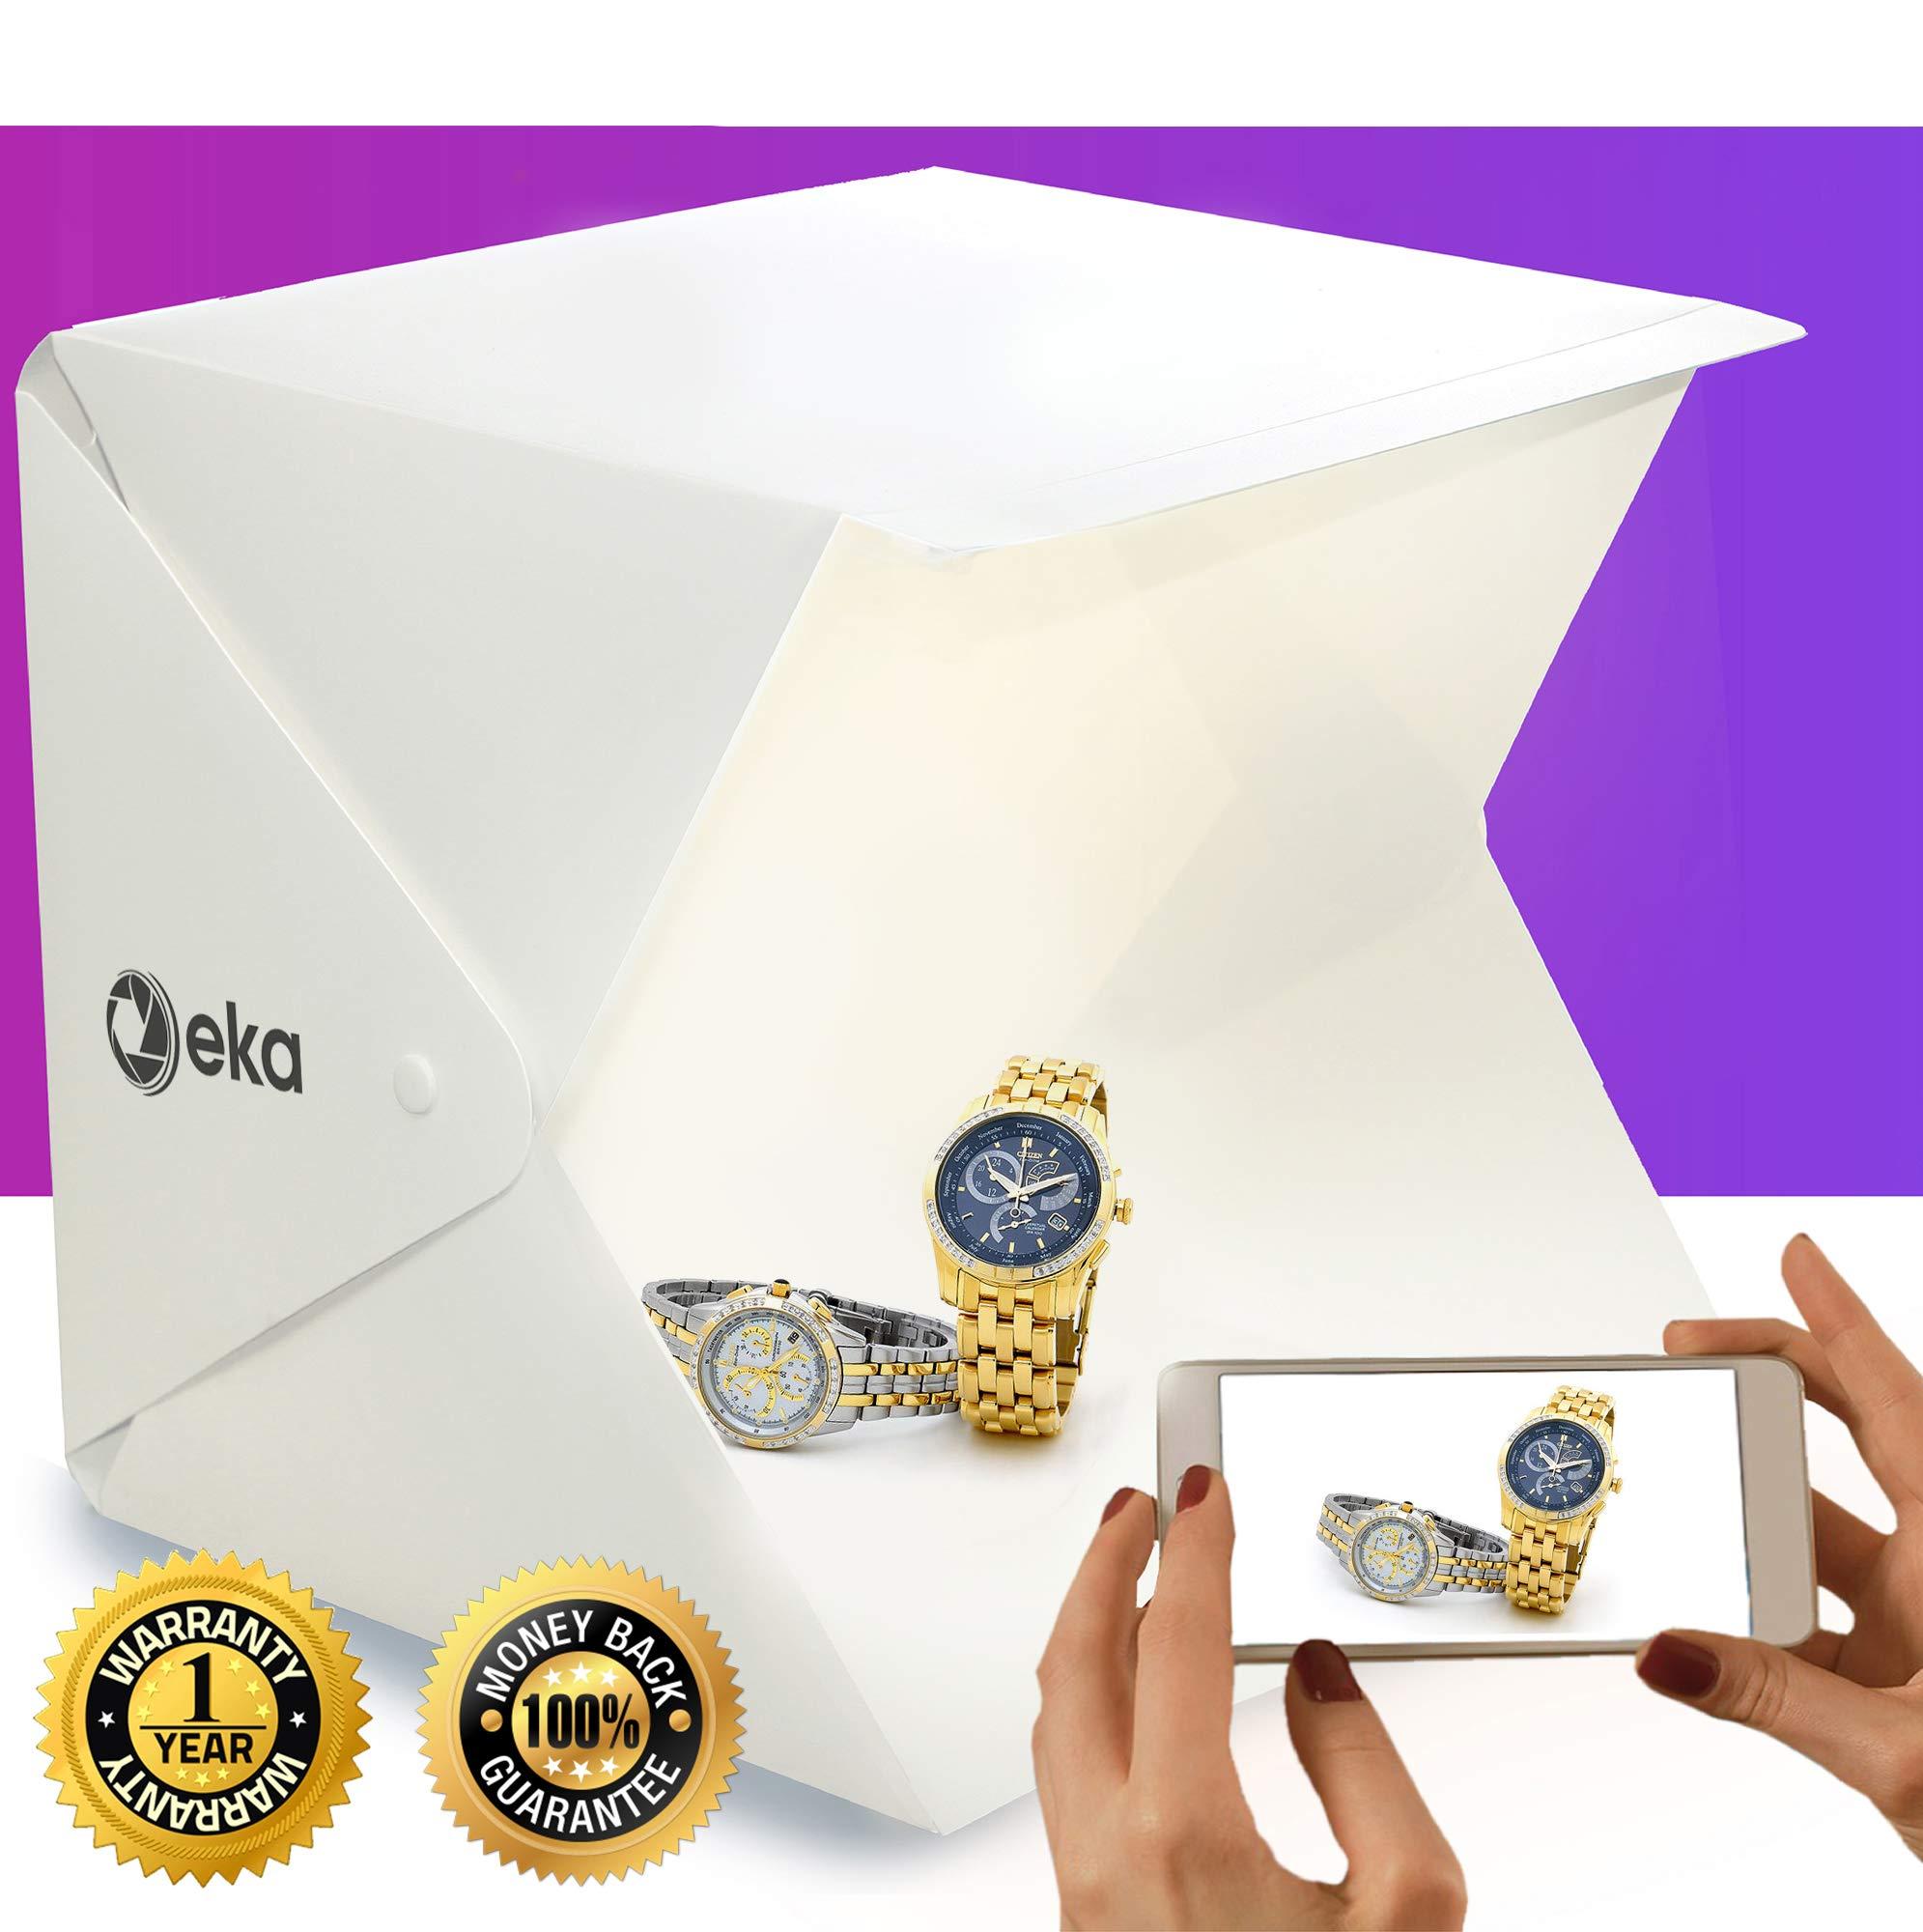 Photo box - Lightbox - Portable photo studio - Light box photography - Product photography light box - Photo light box - Light tent - Mini led studio photo box - Product photography kit - Light box